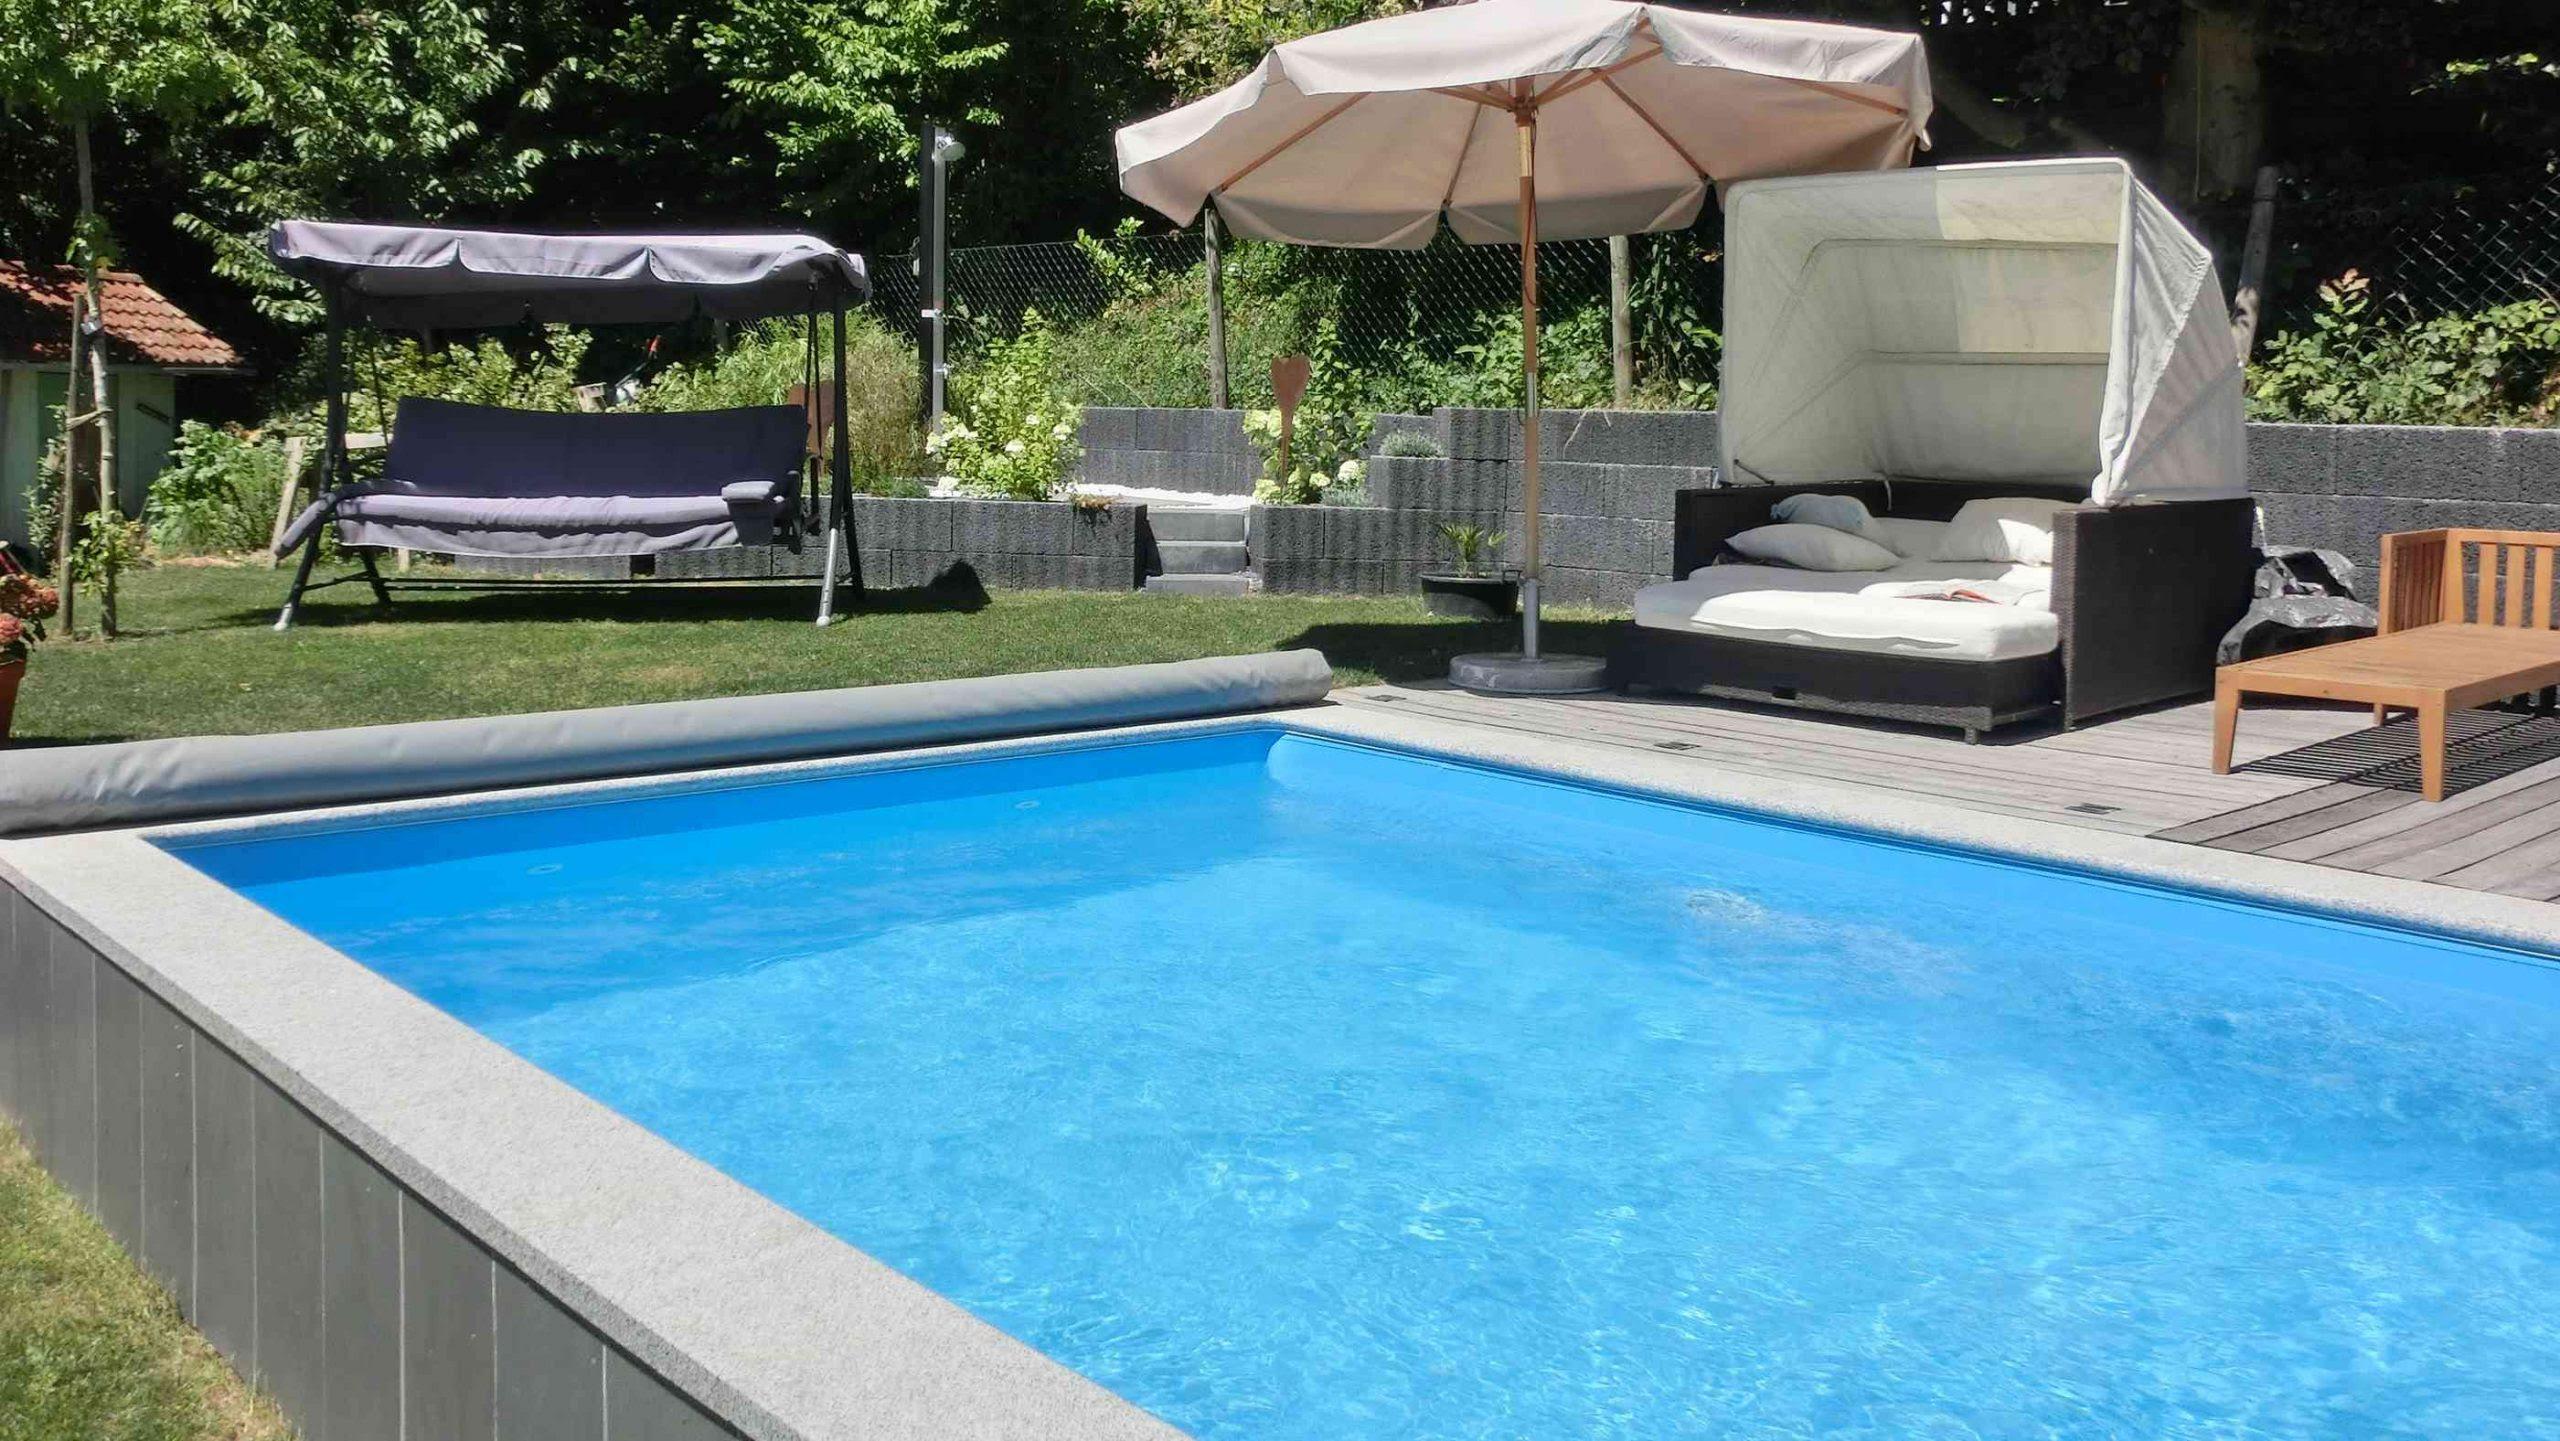 pool im garten bauen lassen kosten genehmigung selber